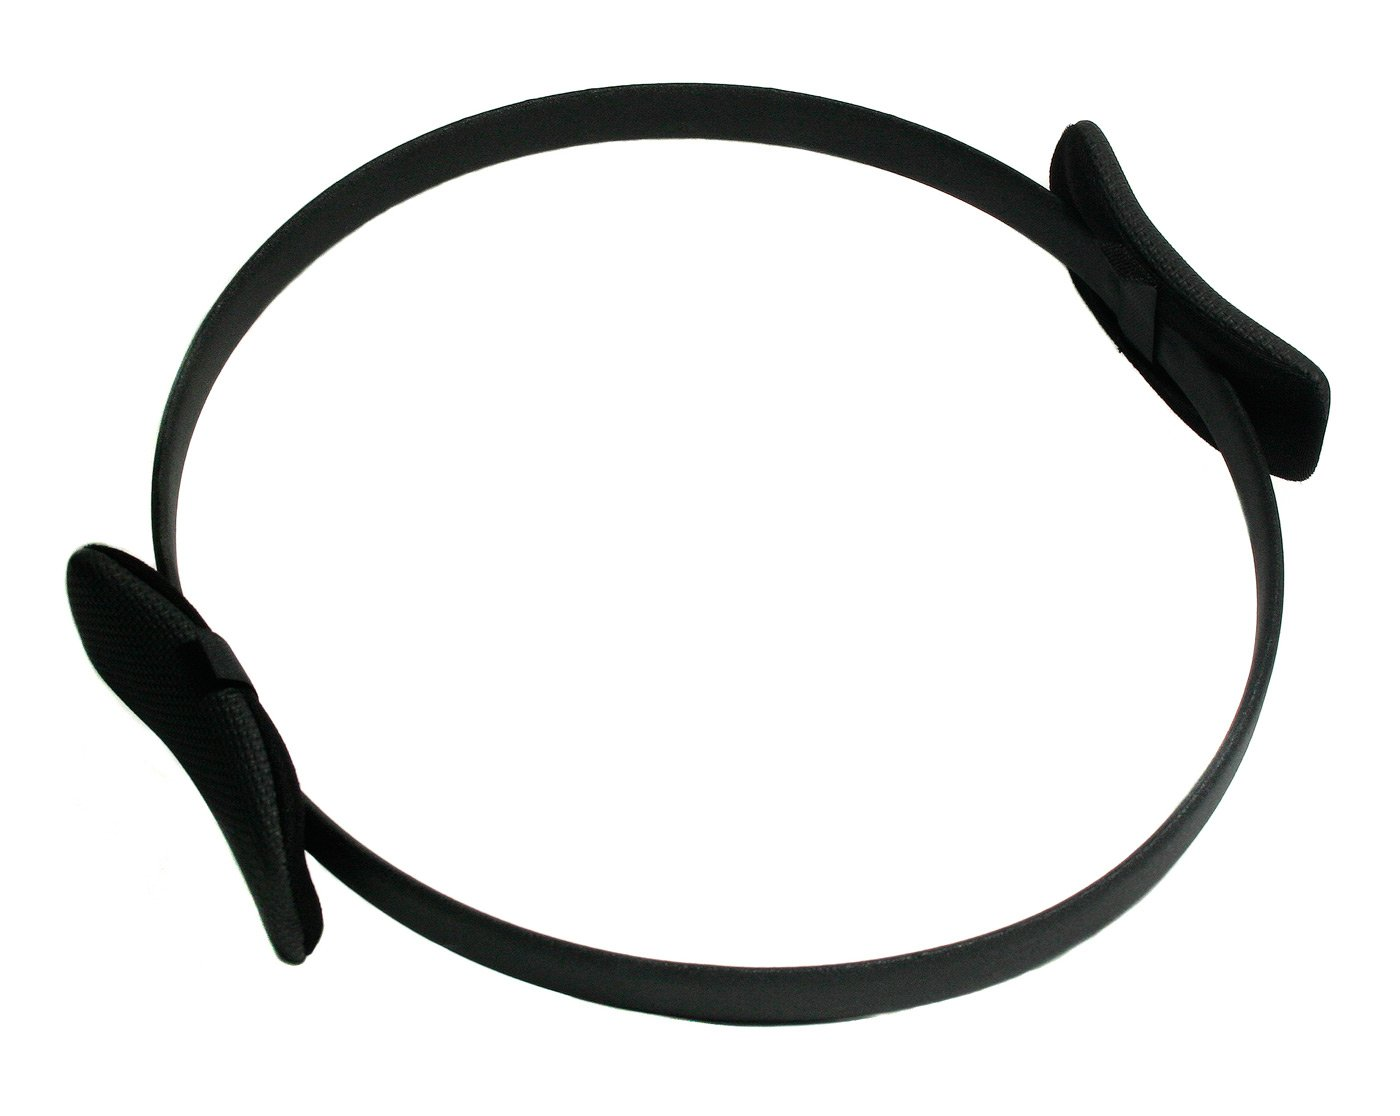 Yogistar 105517 - Anillo de ejercicios para pilates (metal, antideslizante), color negro